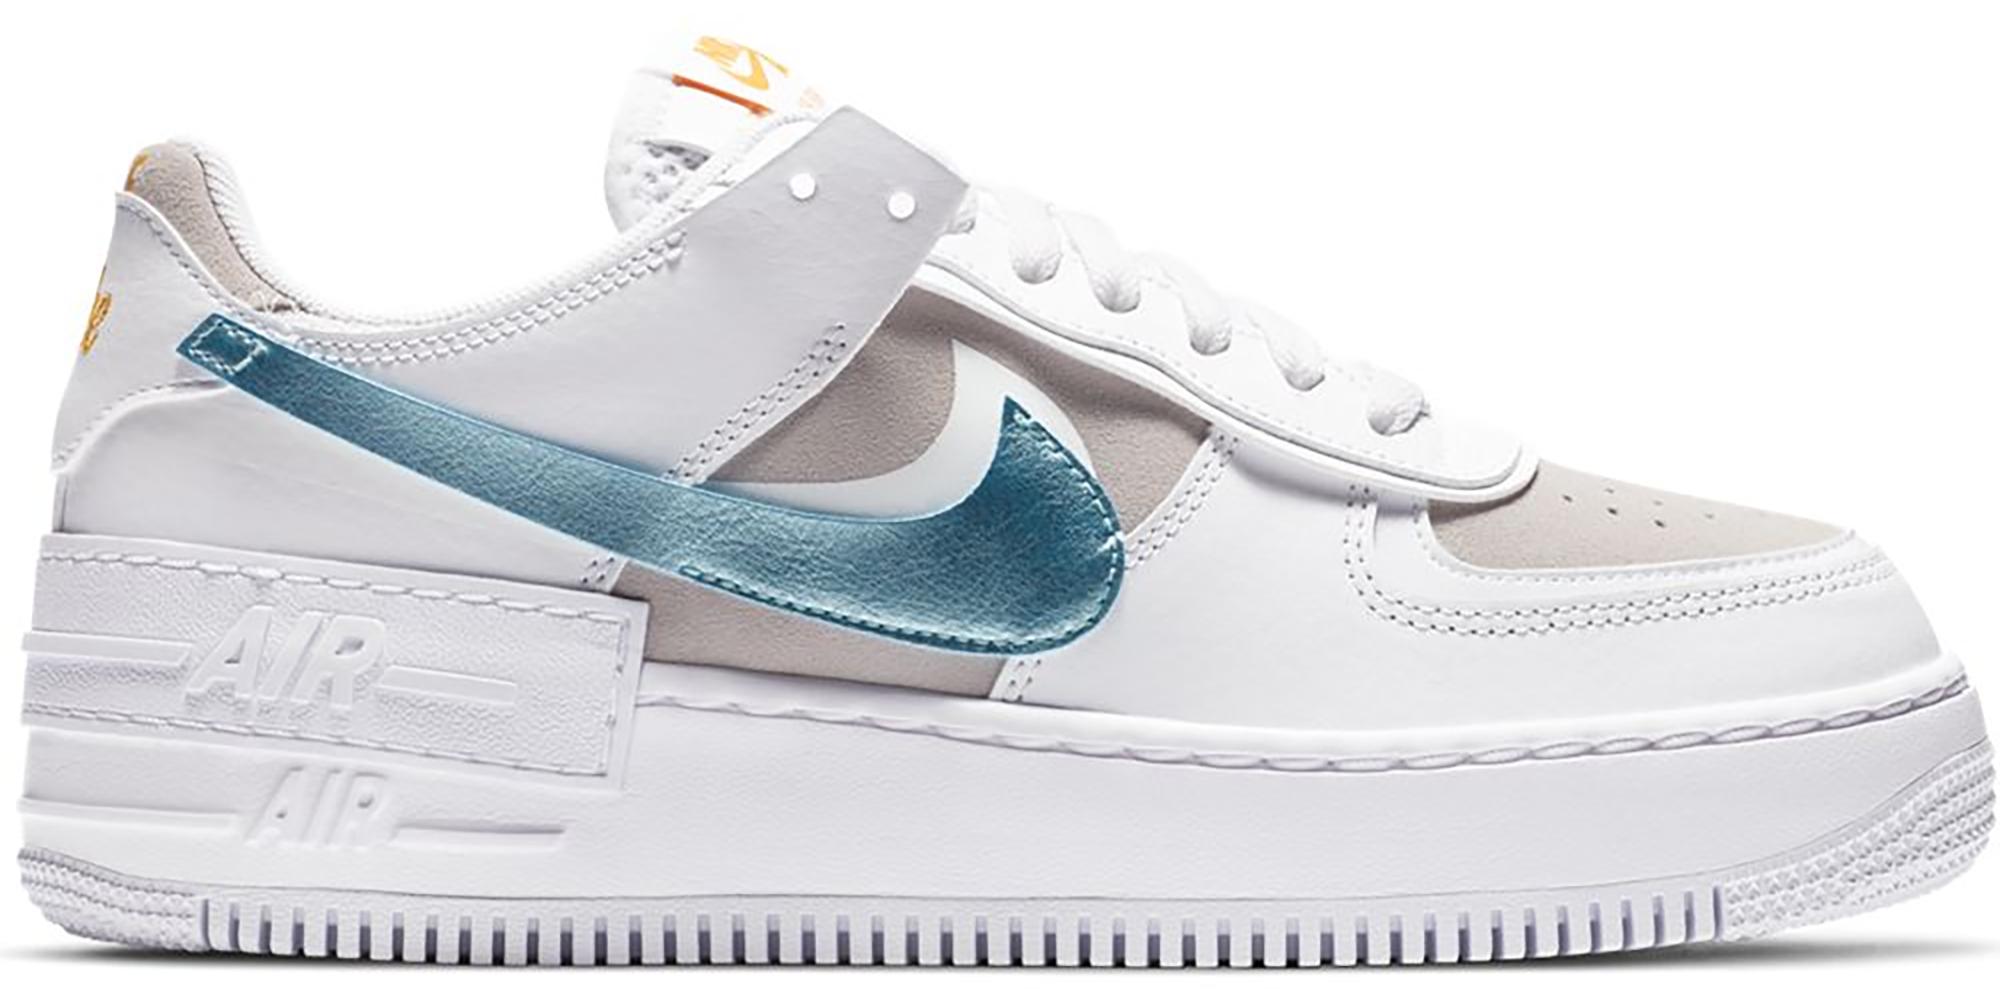 Nike Air Force 1 Shadow White Vast Grey